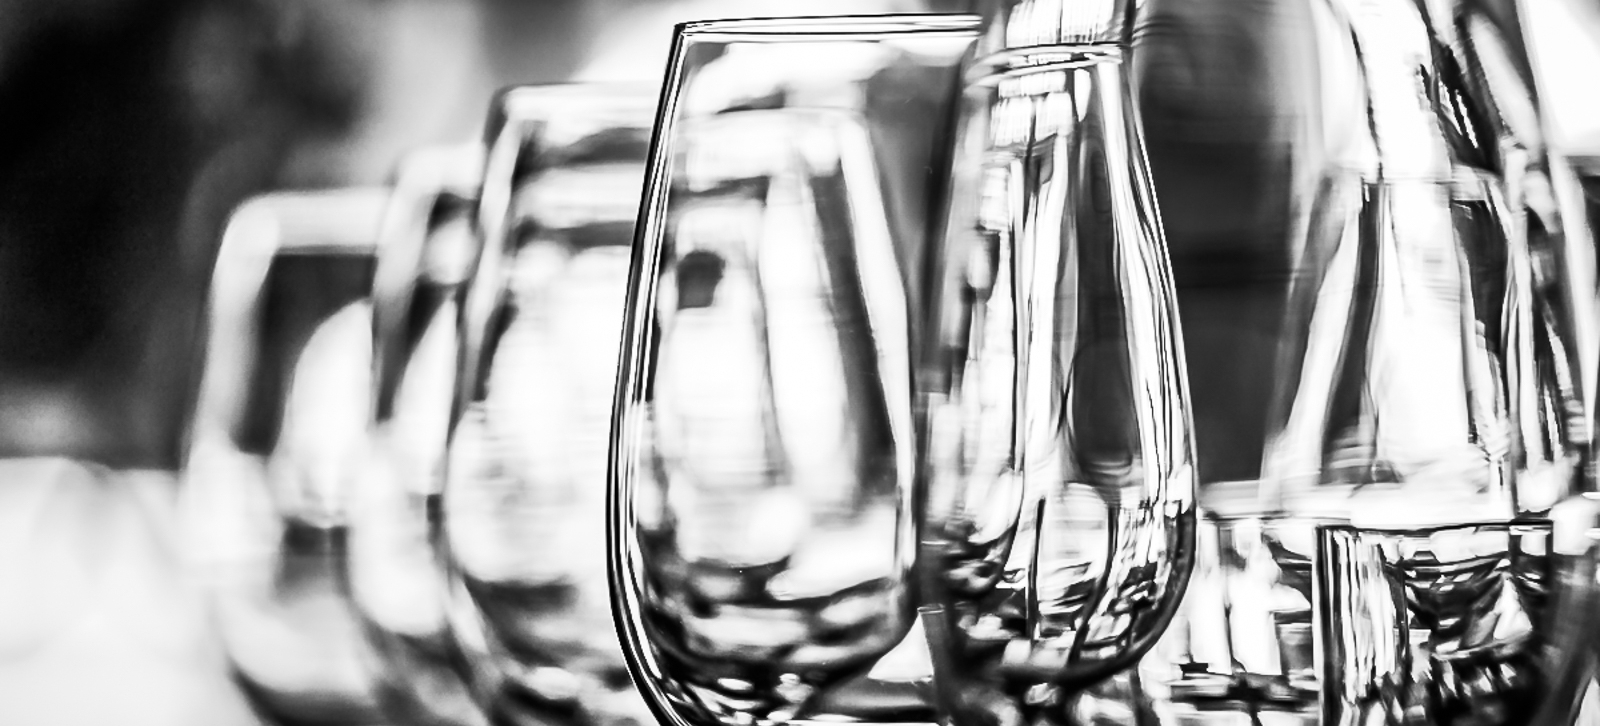 103_Maison-dAmis-wine-bw_Joseph-Barber-Photography.jpg